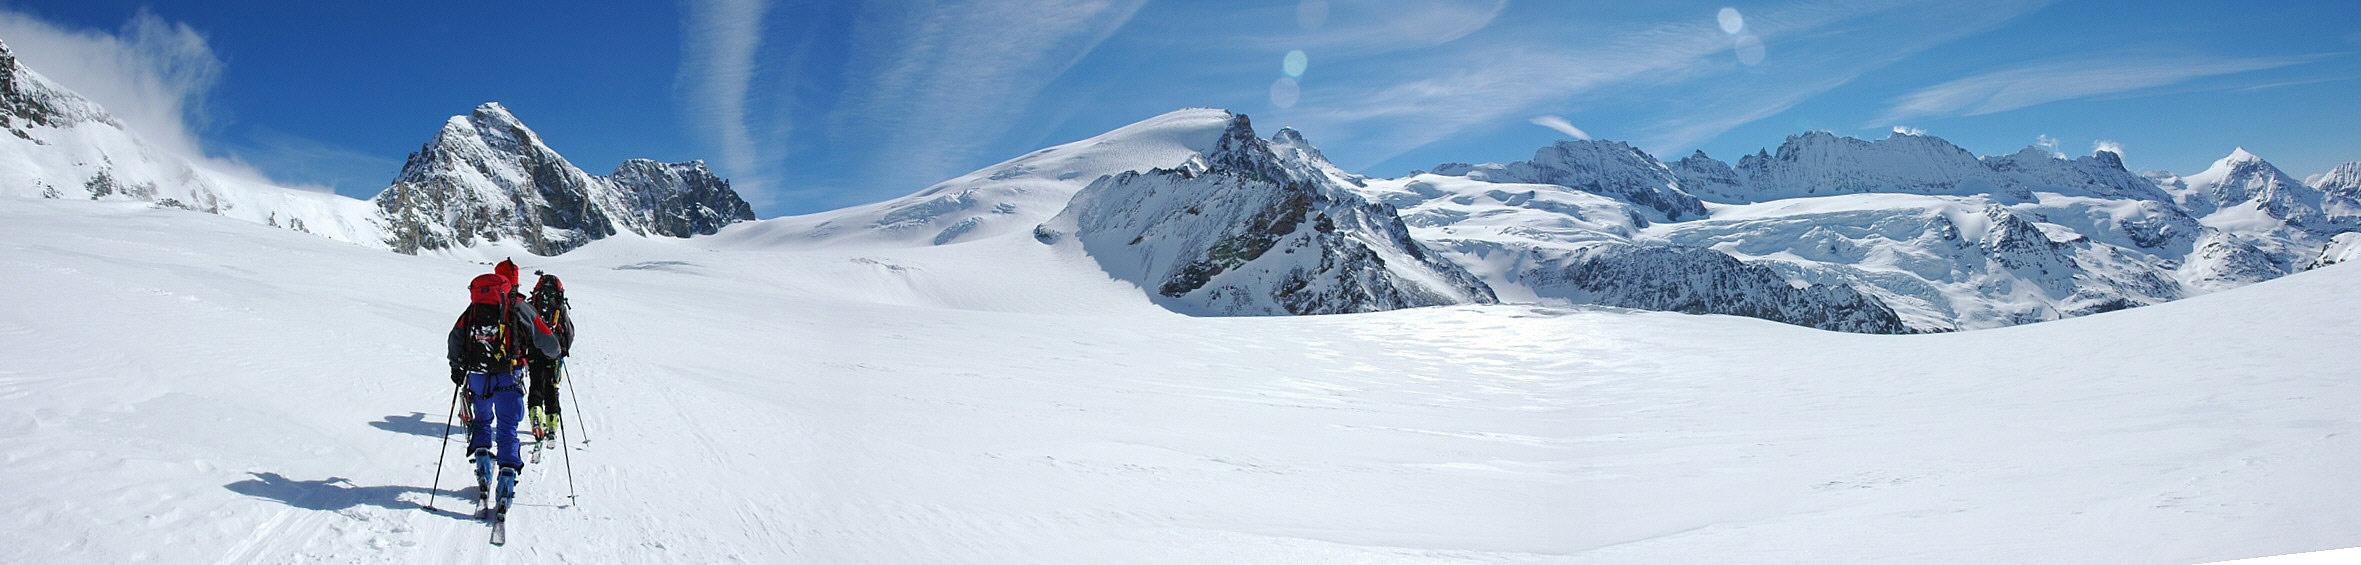 Col Valpelline, Day 6 H.R. Chamonix-Zermatt Walliser Alpen / Alpes valaisannes Švýcarsko panorama 24